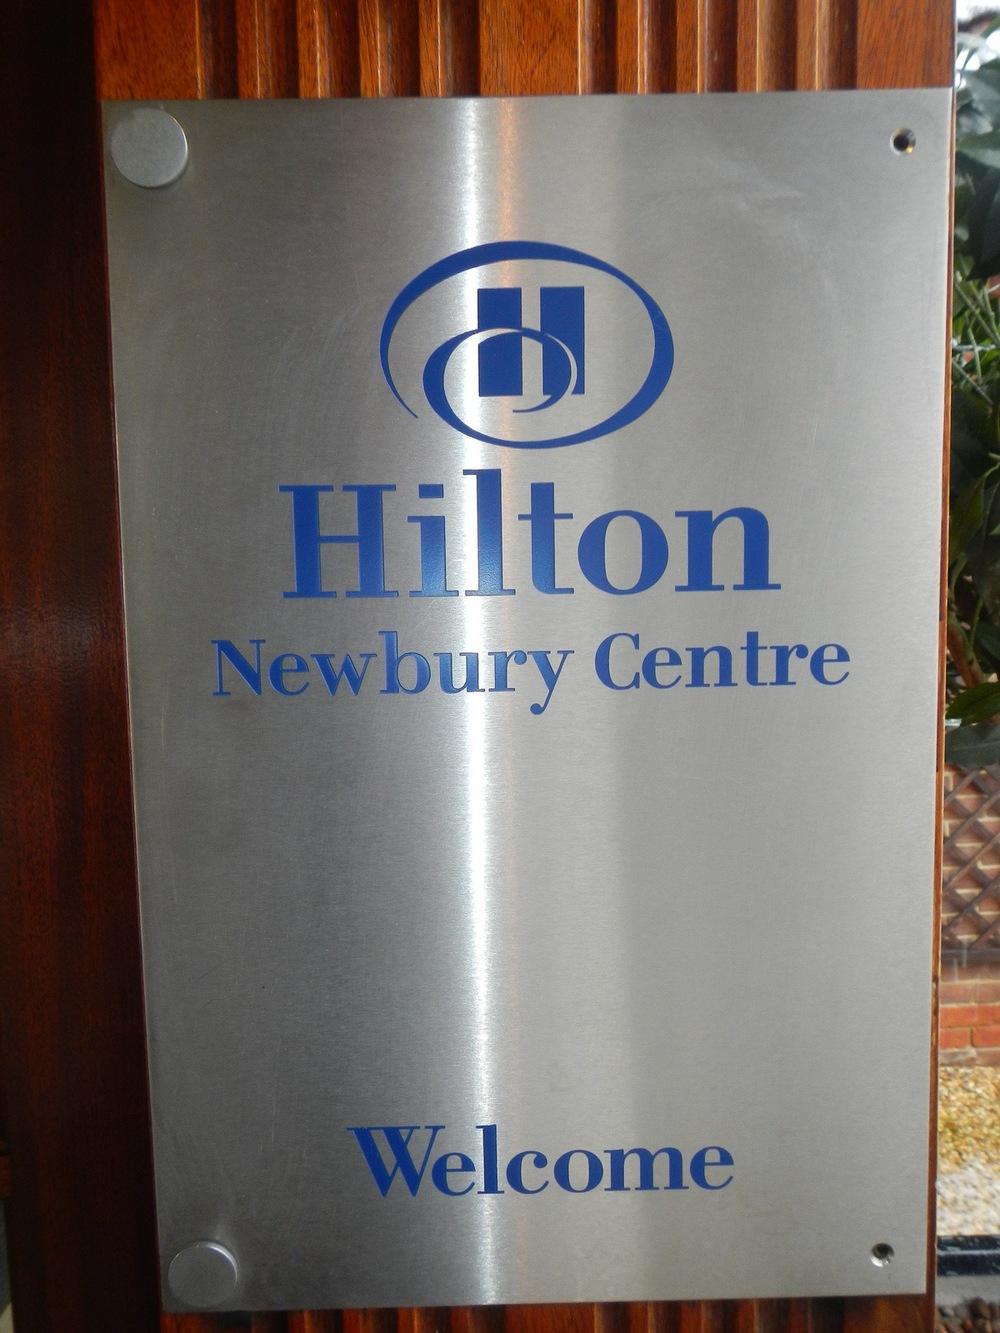 The Hilton in Newbury